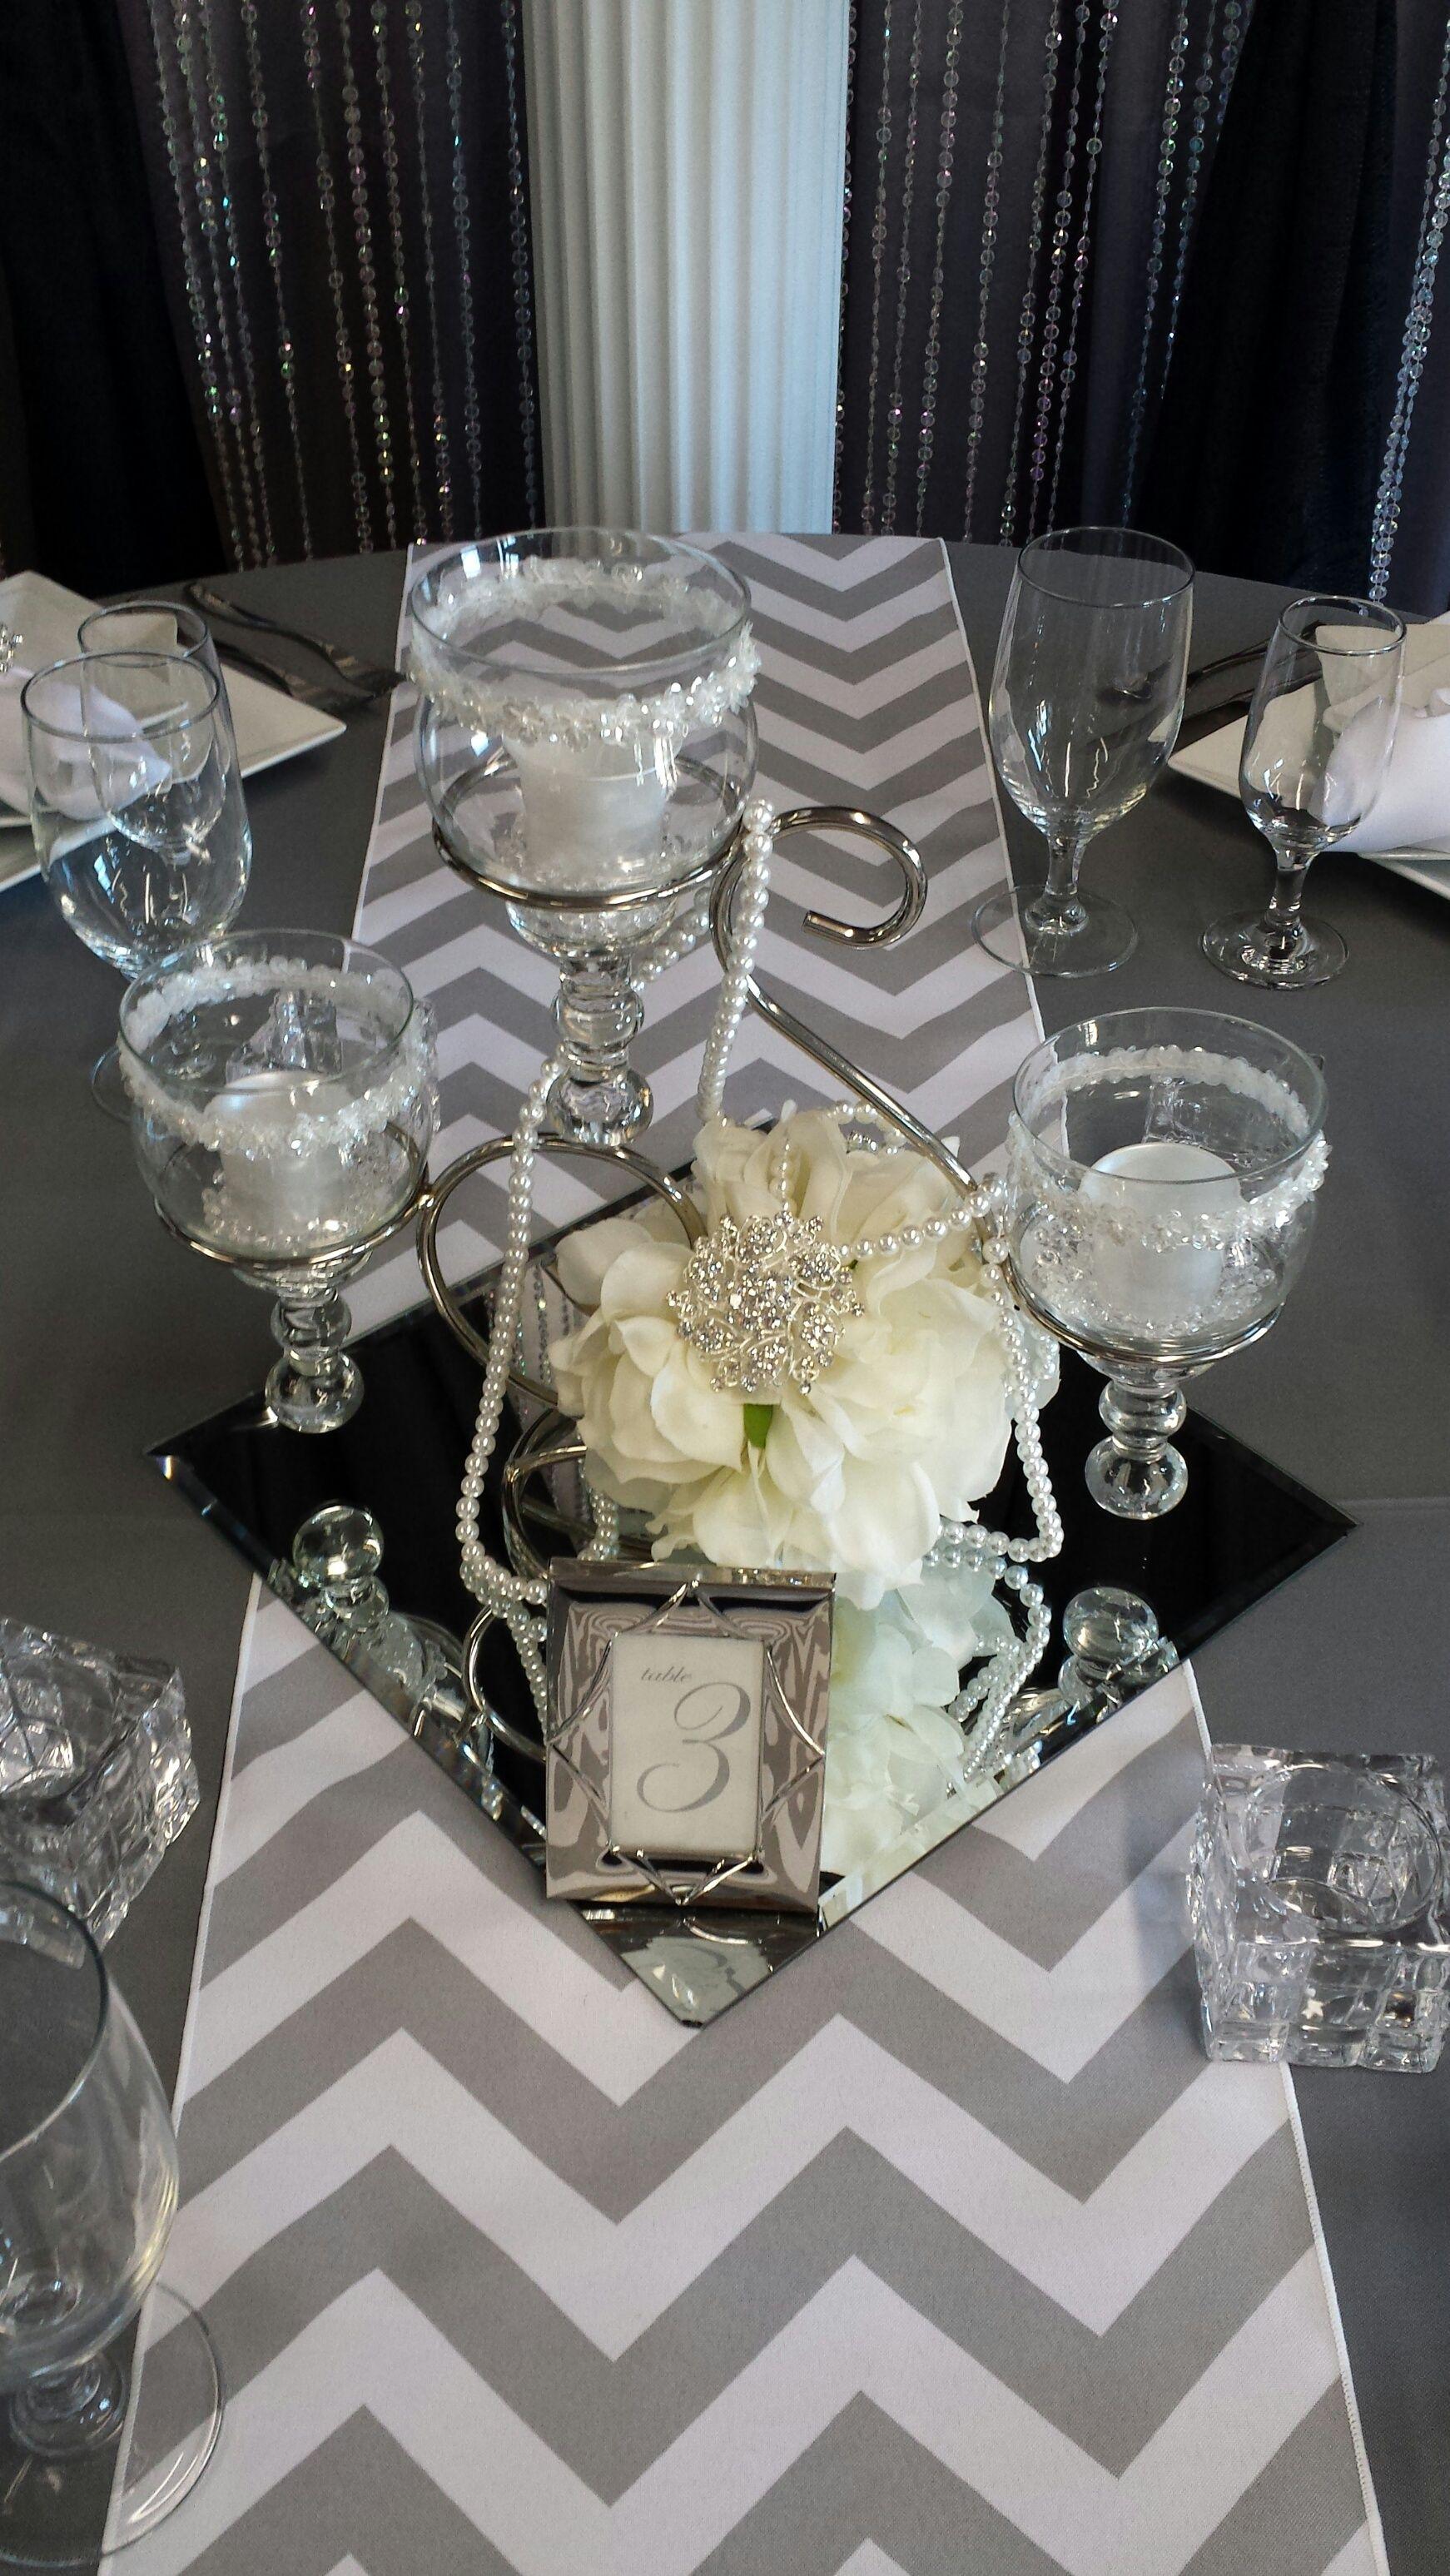 Centerpiece, Table Centerpieces Ideas On A Budget Wedding Centerpiece Ideas  Wedding Table Decoration Ideas On A Budget Living Room Mirror Centerpieces  Diy ...